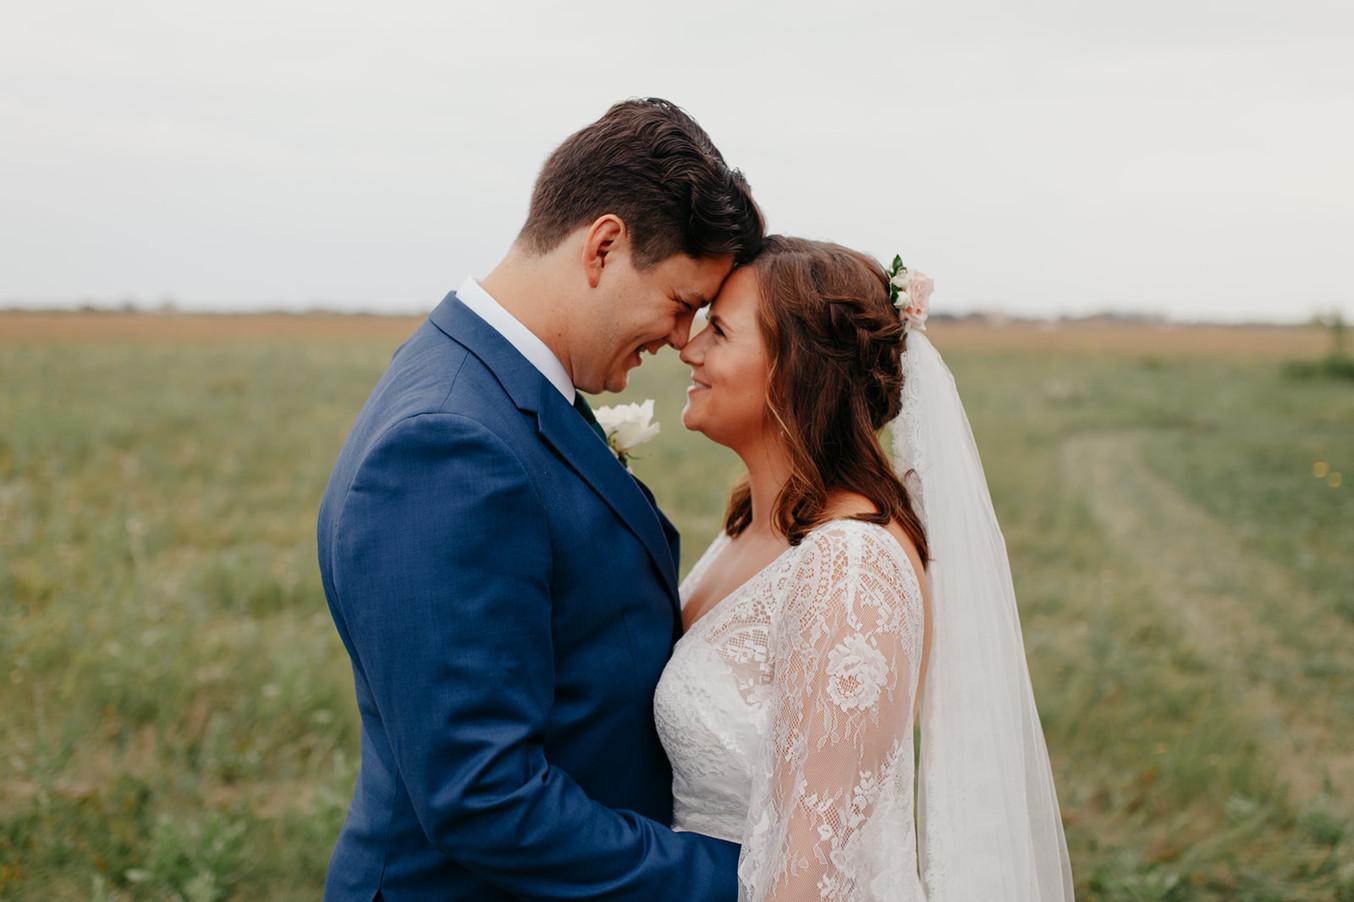 Winnipeg Wedding Photographer Krista Hawryluk - boho dress, dress with sleeves